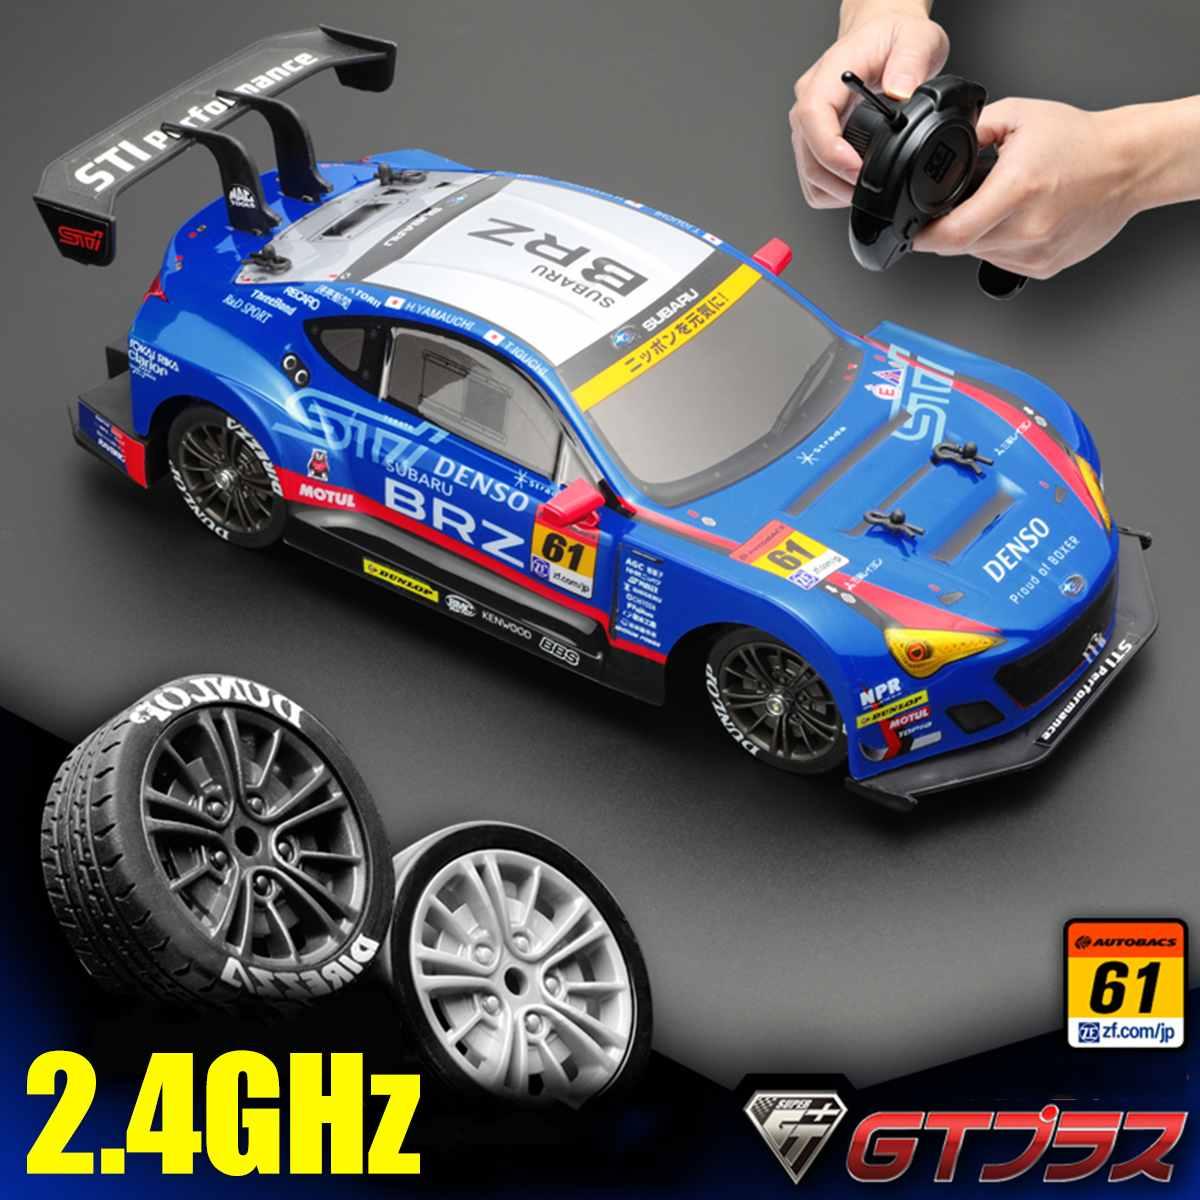 1:16 RC Car 4WD Drift Racing Car Championship 2.4G Off Road Radio Remote Control Vehicle 360 Rotating Stunt RC Car Climbing Car